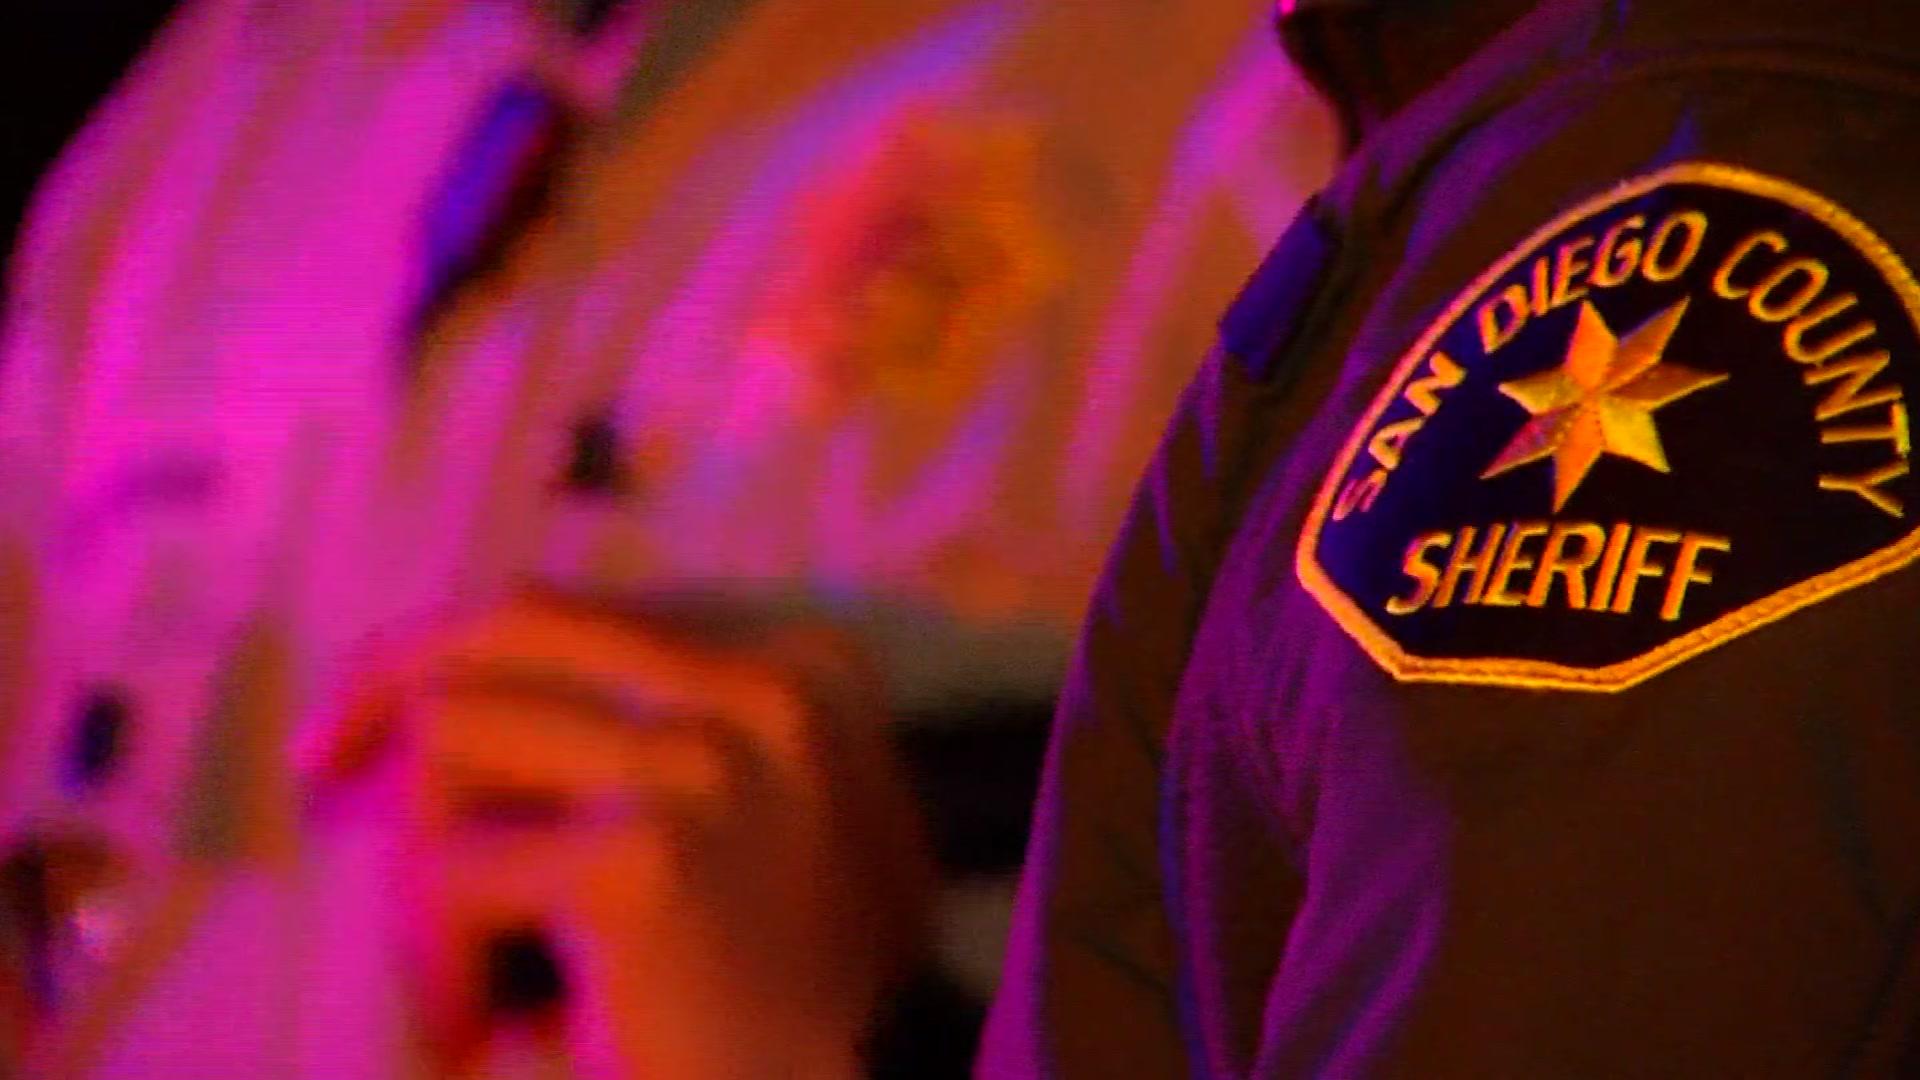 Chula Vista City Employee ID'd as Victim of Casa De Oro Homicide